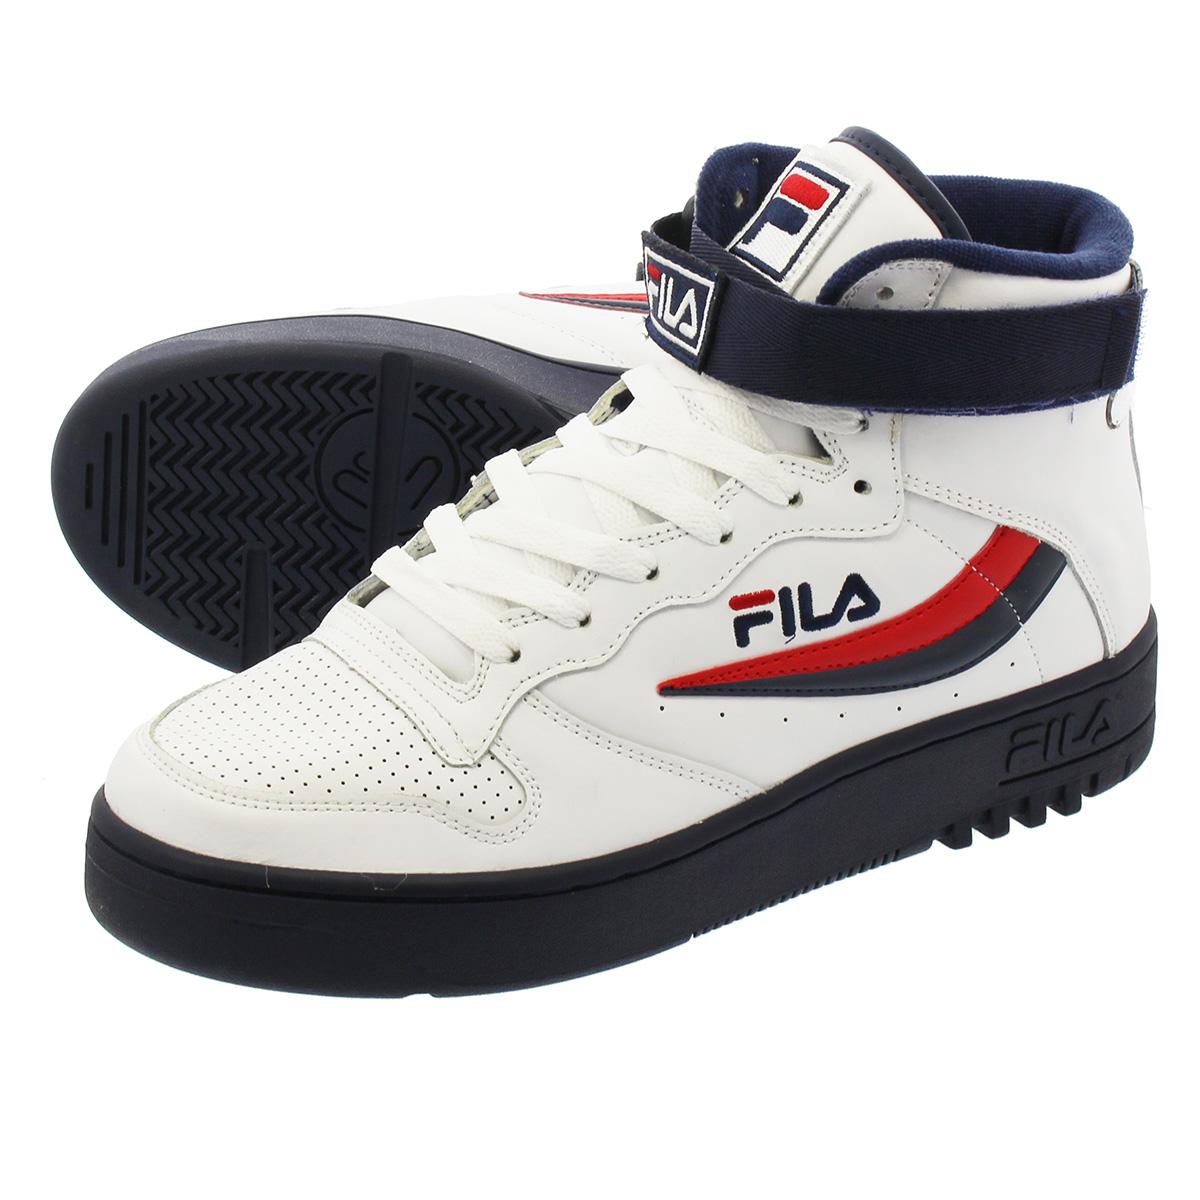 FILA FX-100 フィラ FX-100 WHITE/NAVY/RED